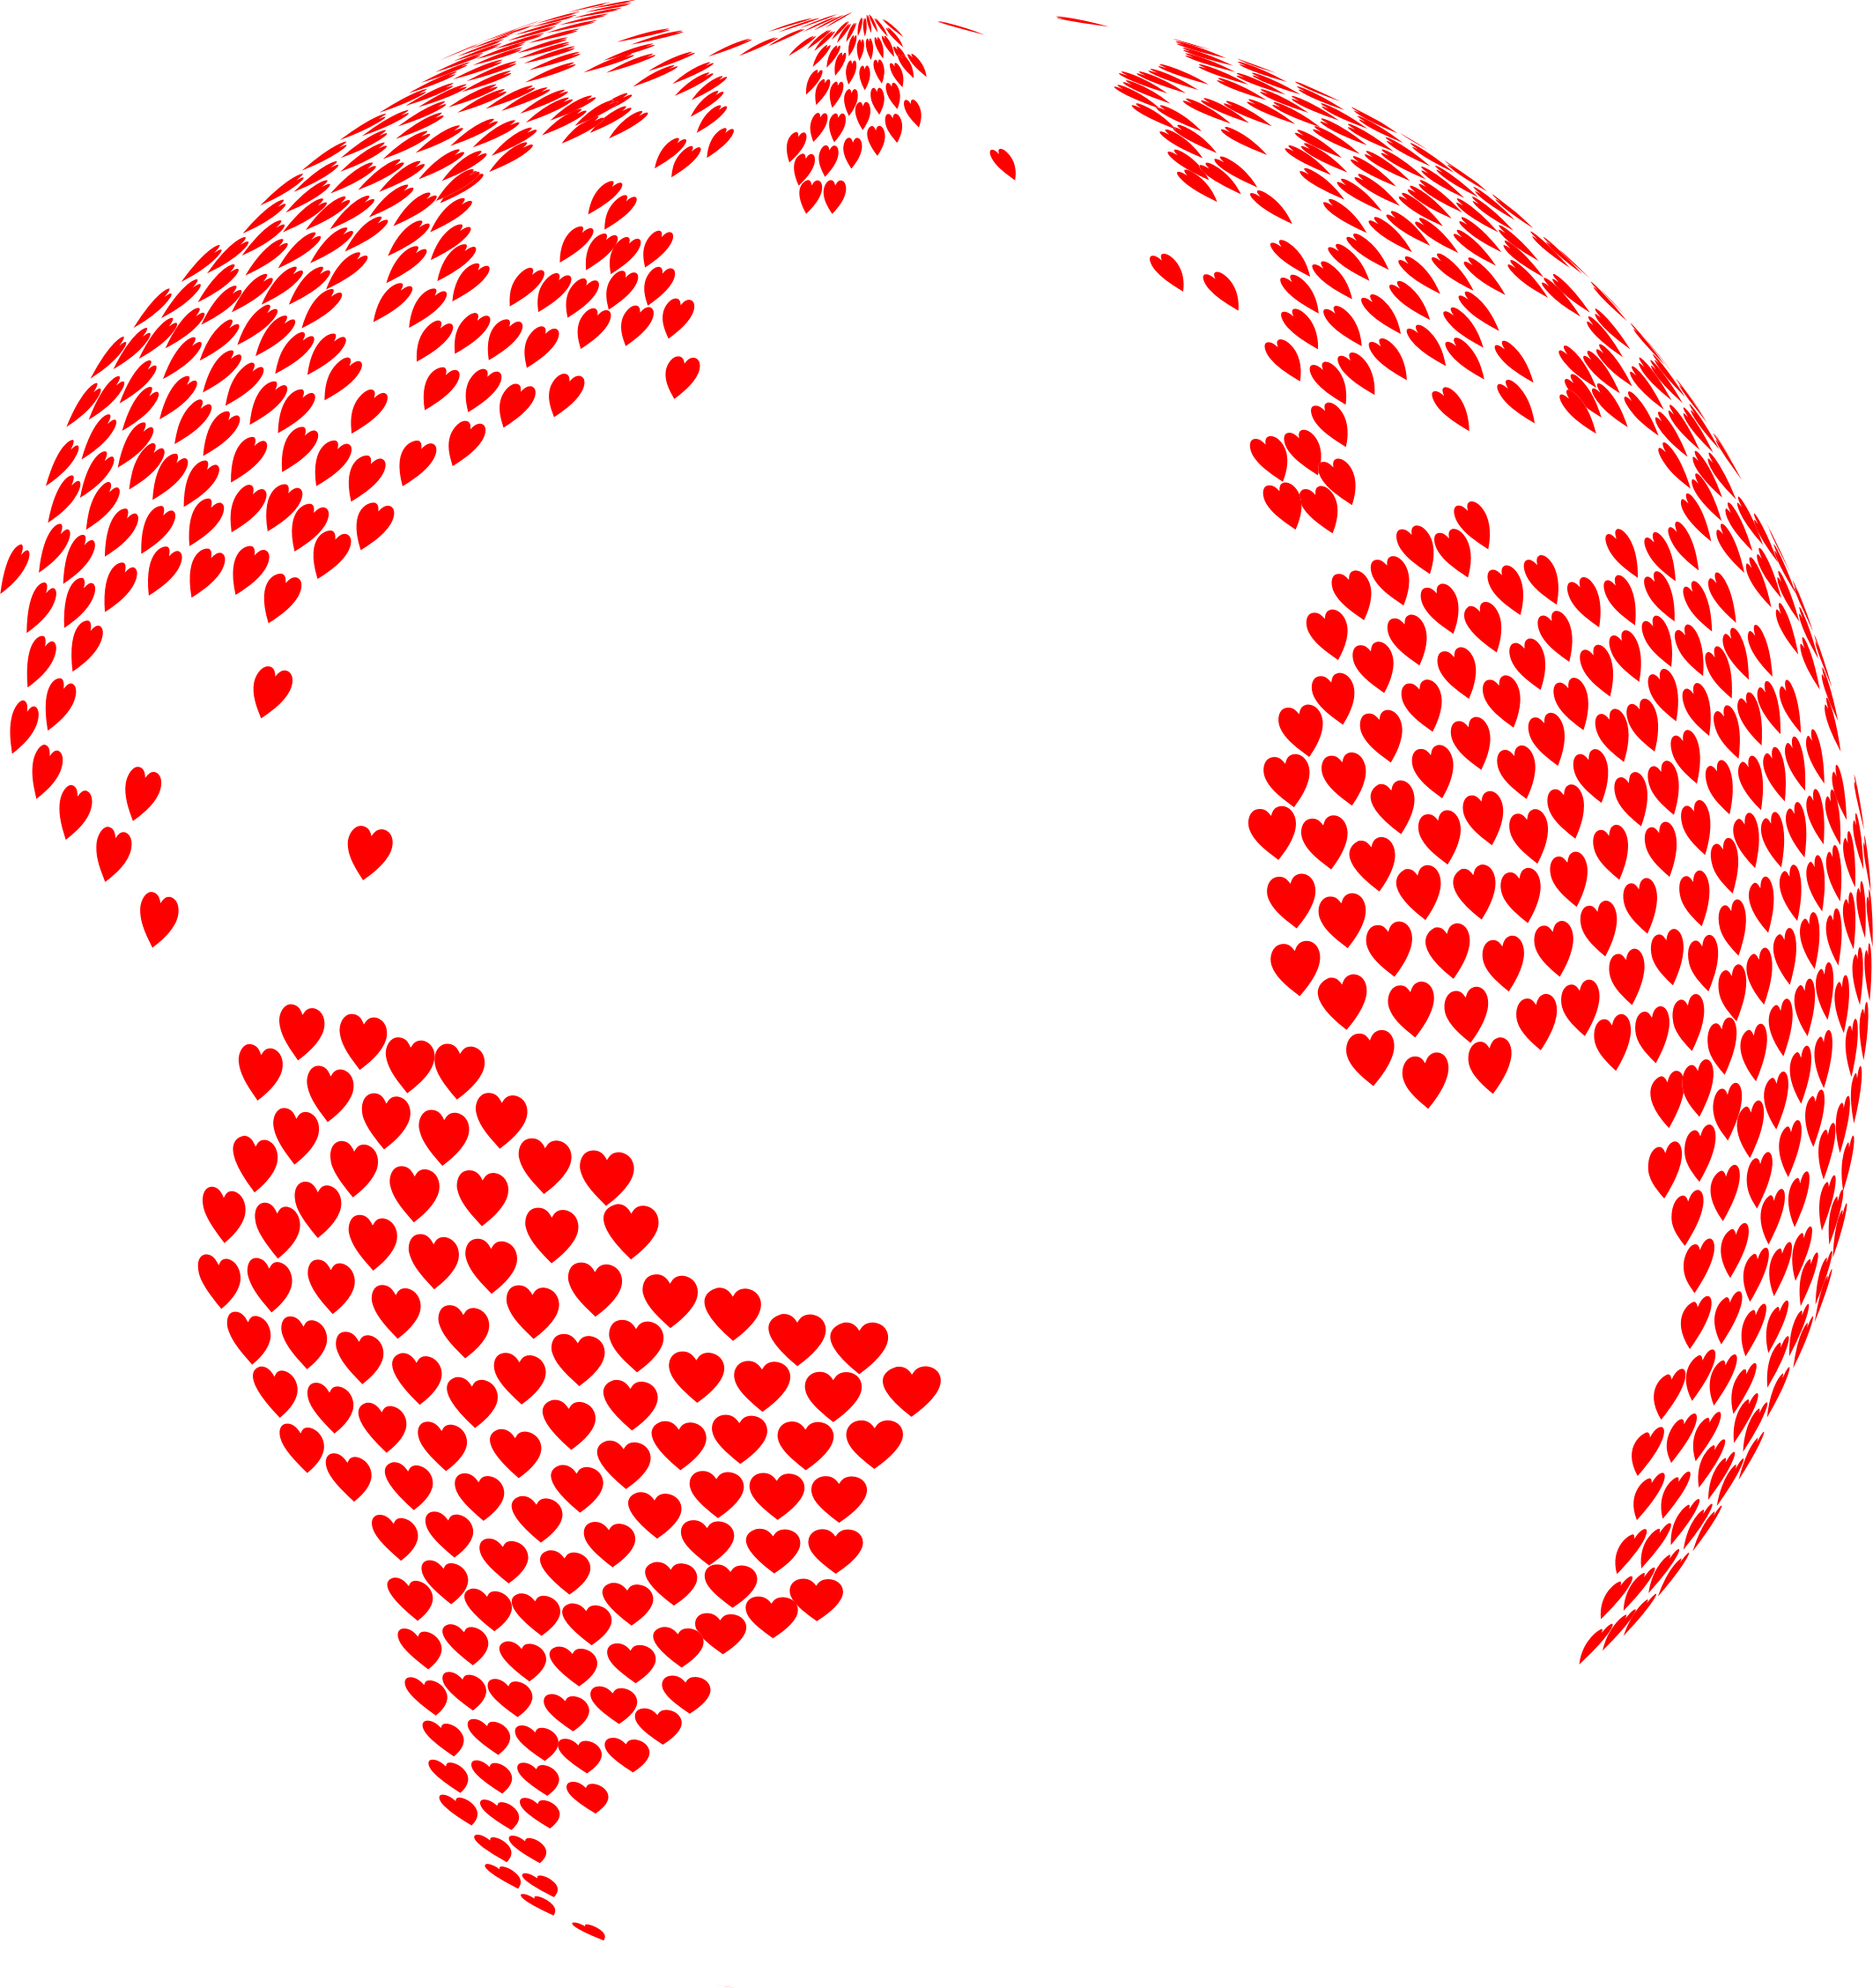 Globe clipart heart. Hearts big image png